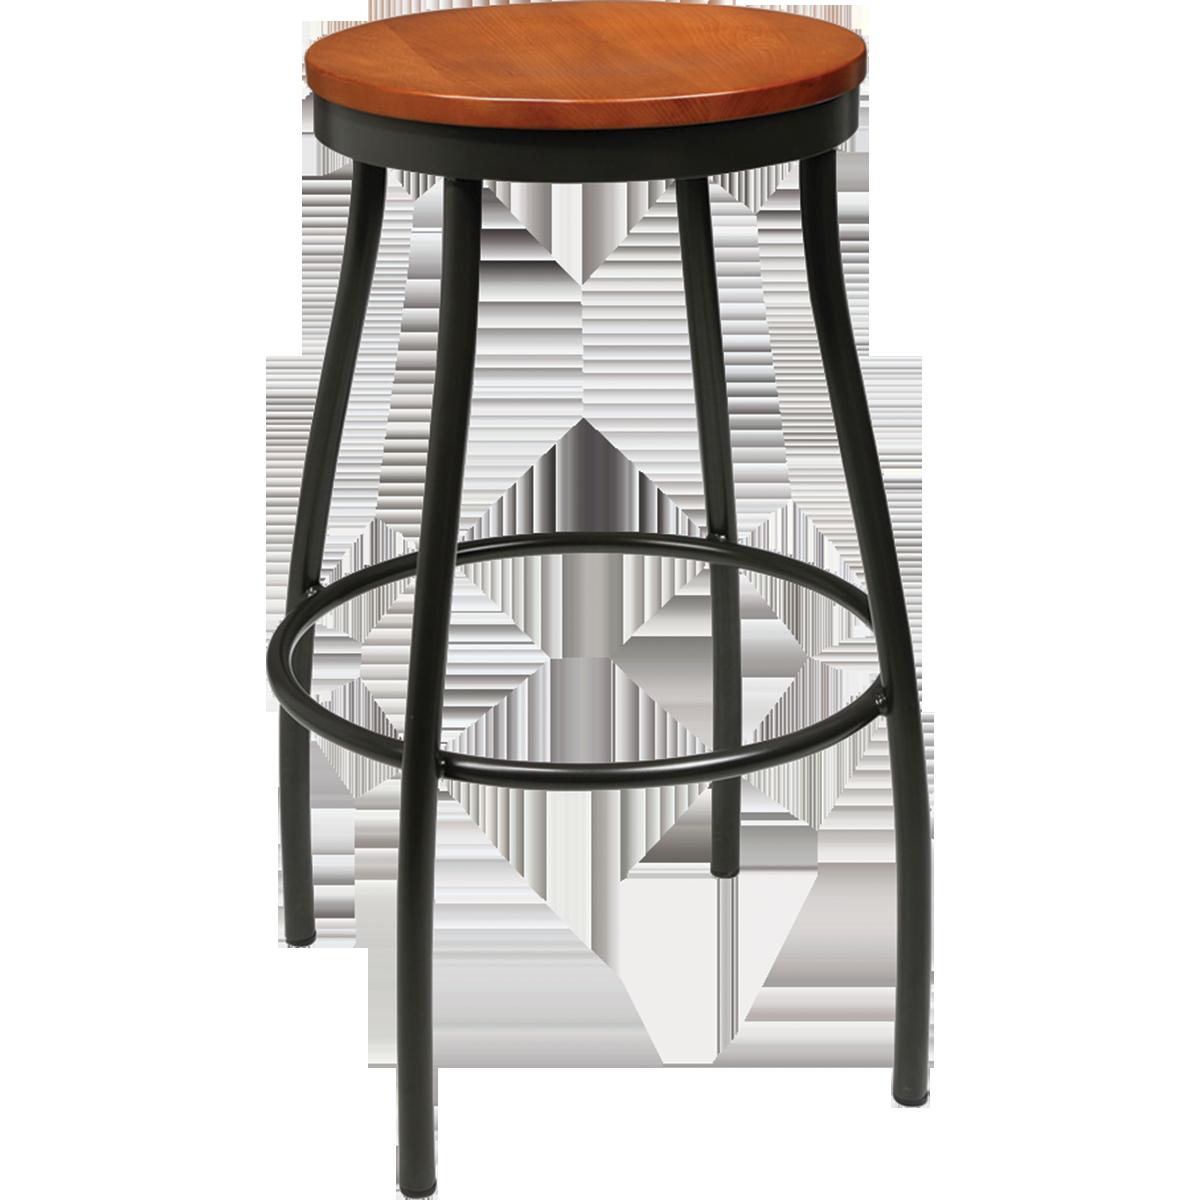 79 Seltenes Metall Holz Bar Hocker Bild Konzept Stuhle